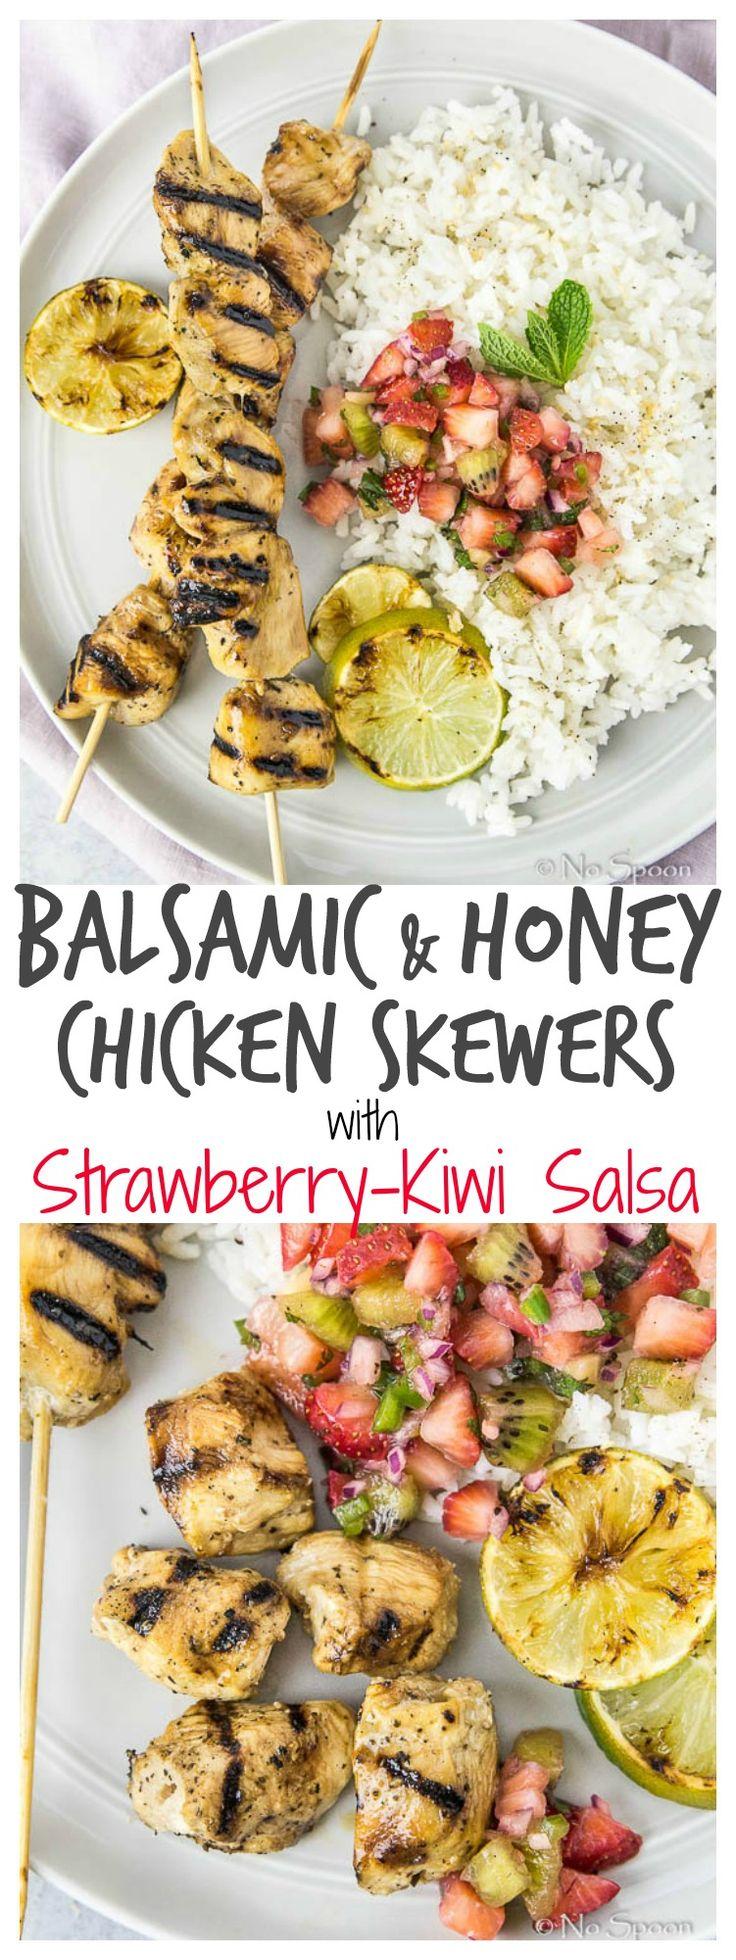 Balsamic & Honey Chicken Skewers with Strawberry-Kiwi-Jalapeno Salsa.